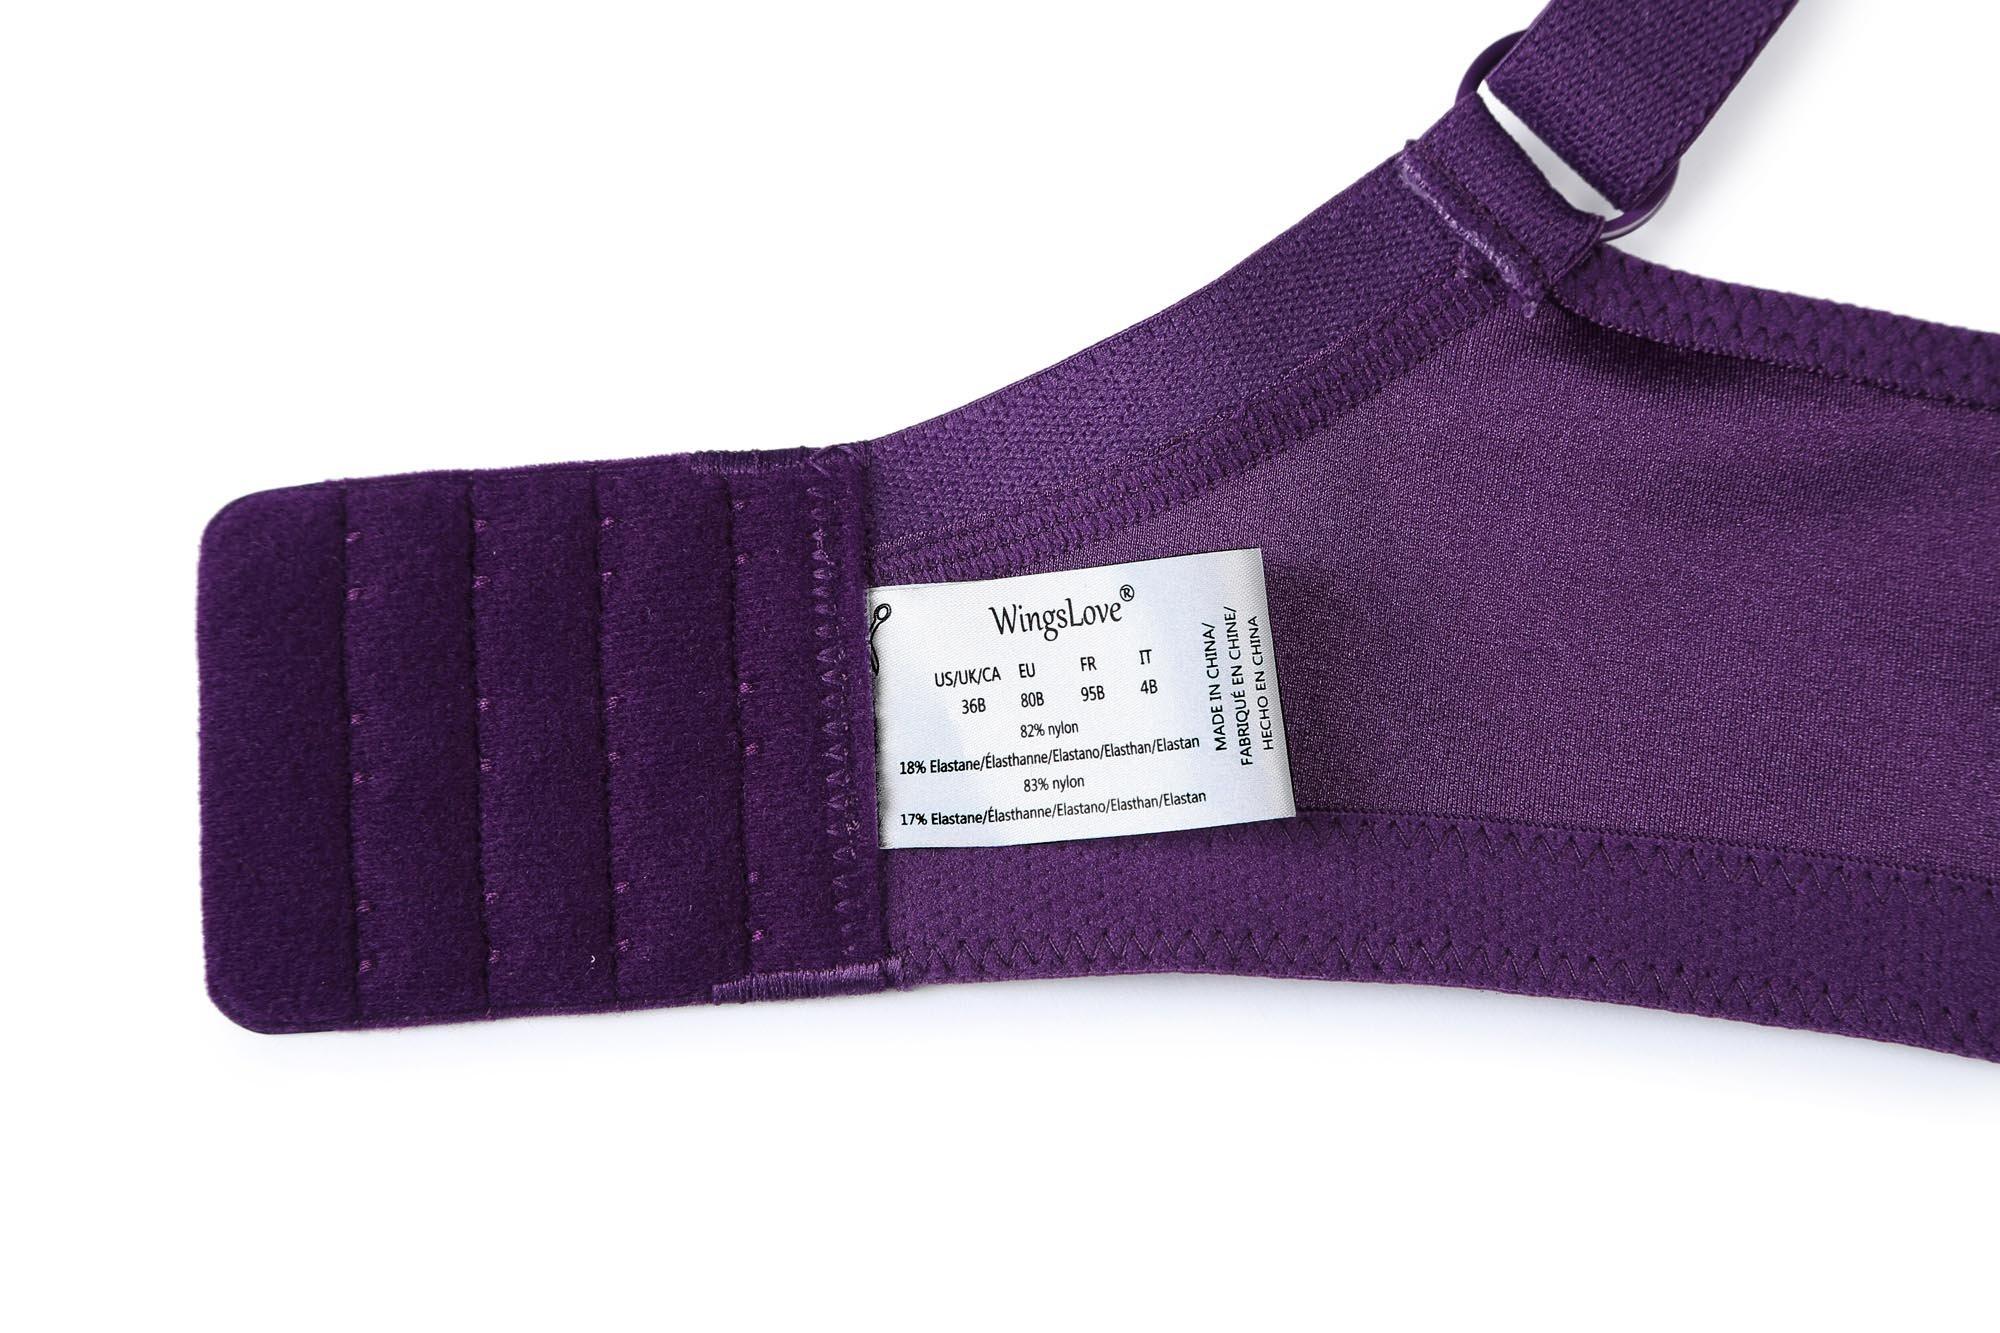 487ed4221c41b Wingslove Women s Full Coverage Non Padded Comfort Strap Minimizer  Wire-Free Bra(Purple